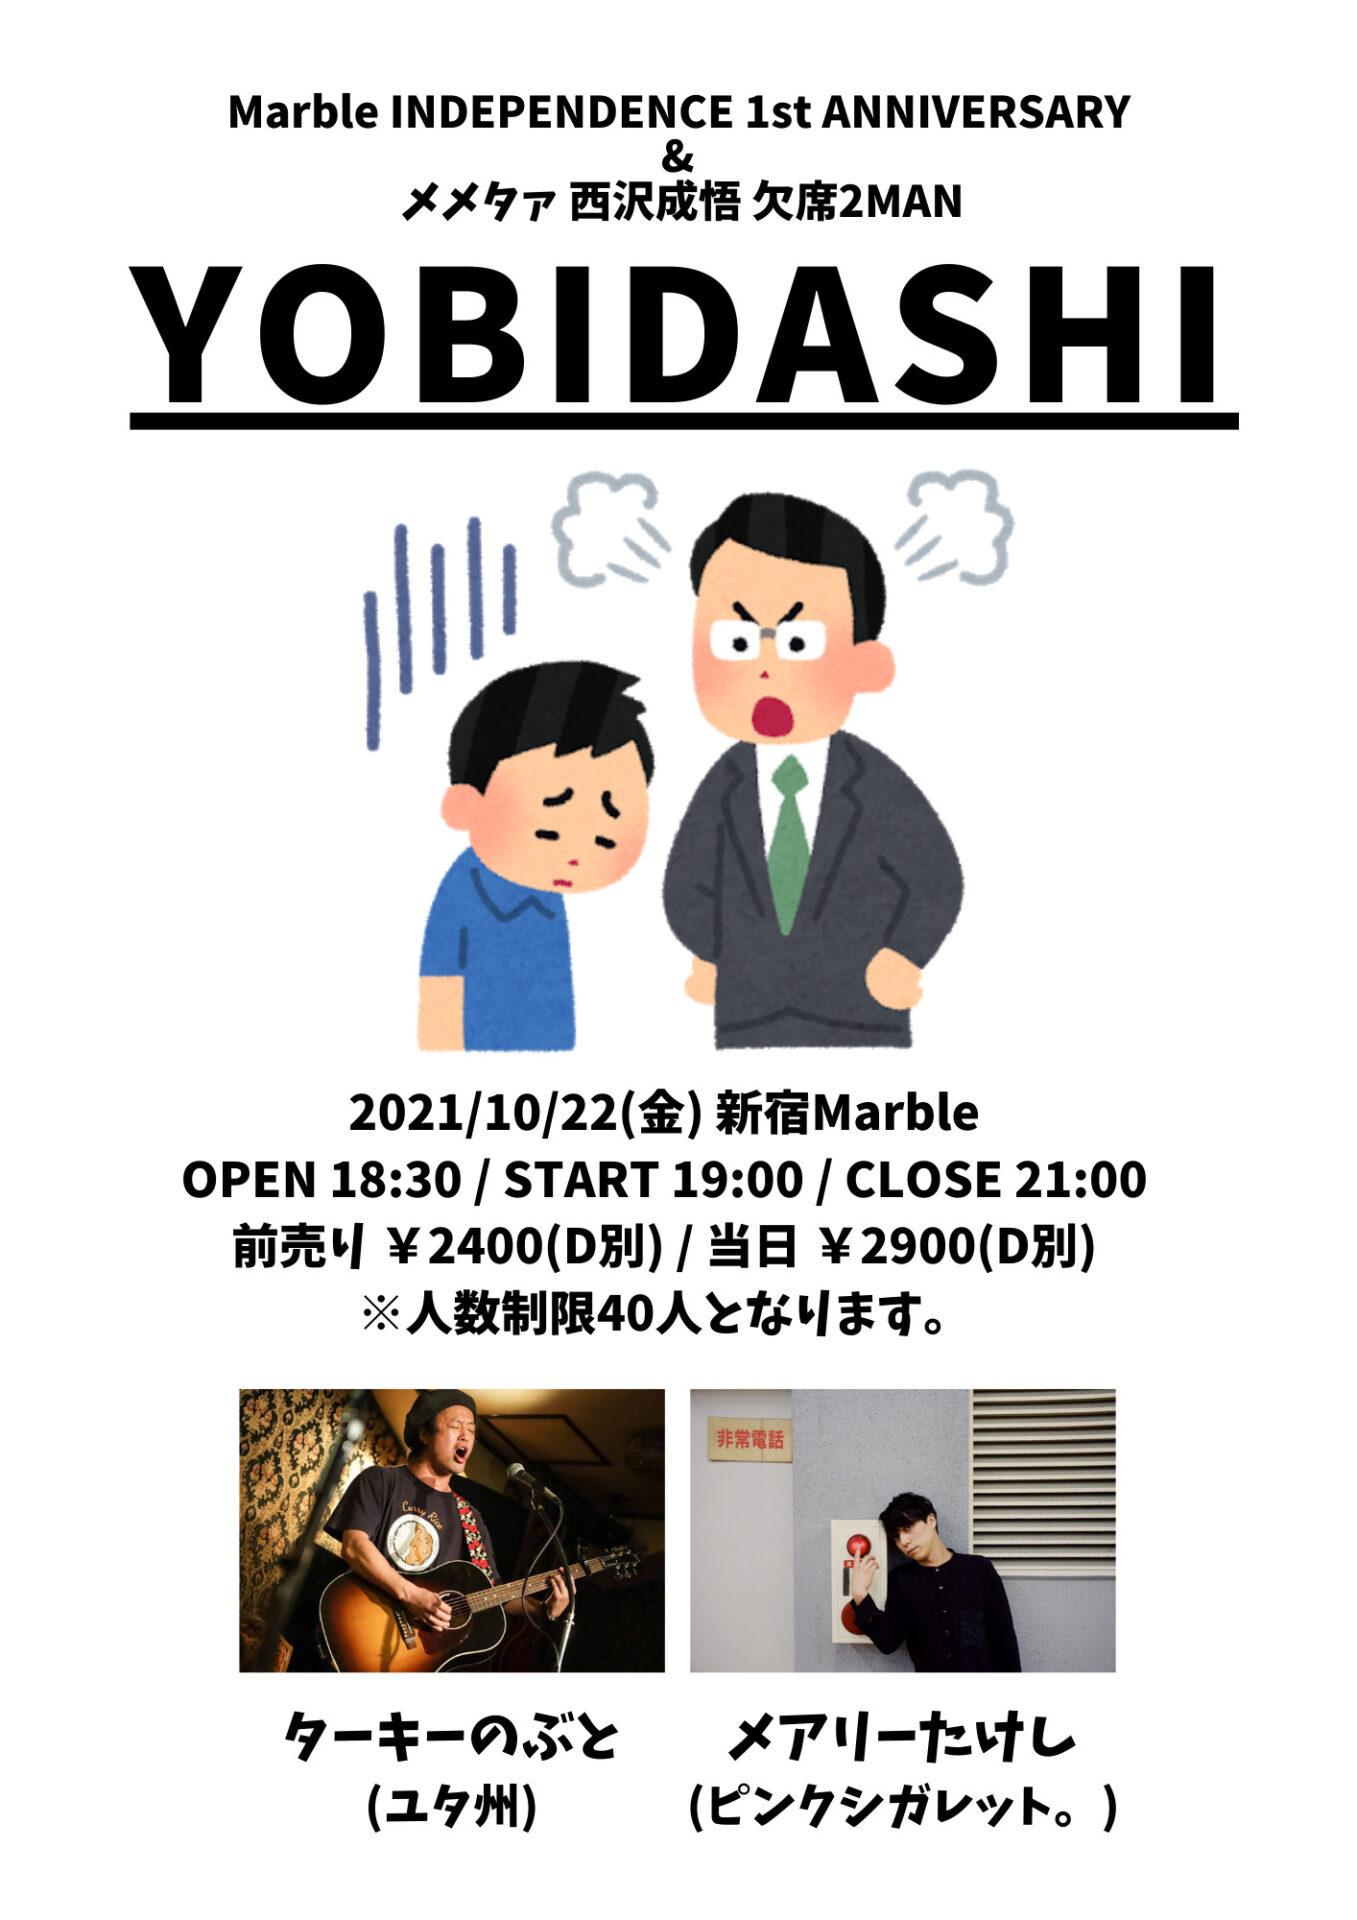 YOBIDASHI-Marble INDEPENDENCE 1st ANNIVERSARY & メメタァ西沢成悟欠席 2MAN-